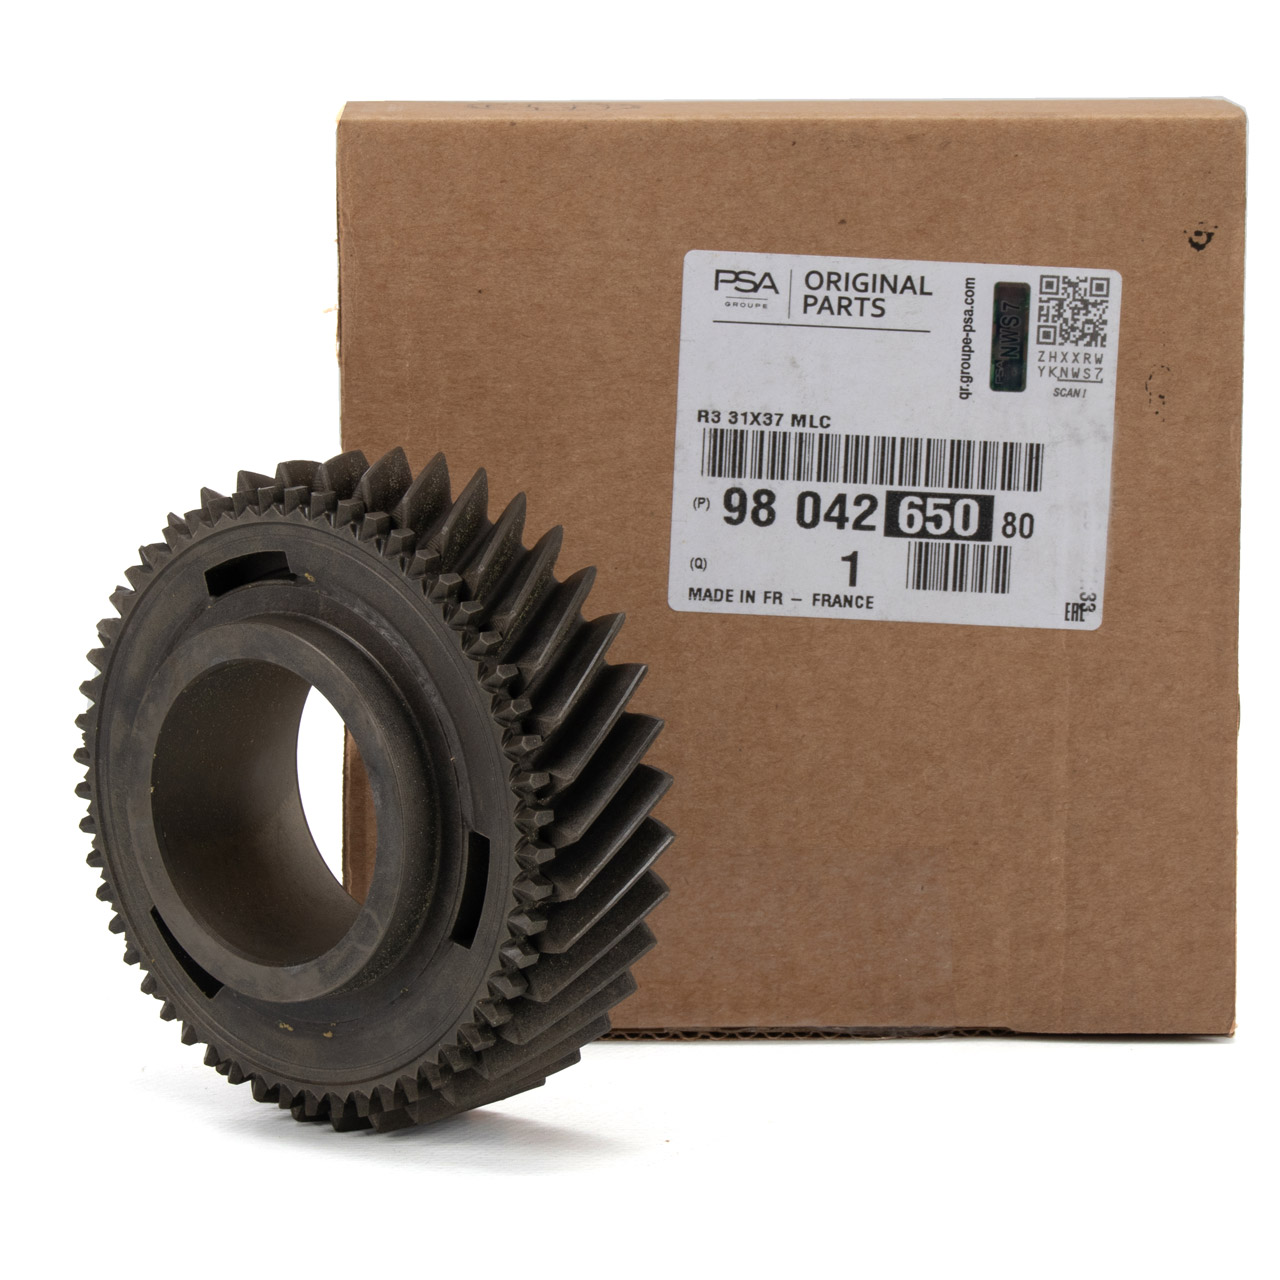 ORIGINAL PSA Zahnrad Getriebeeingangswelle ML6C MLGUC14 Getriebe 9804265080